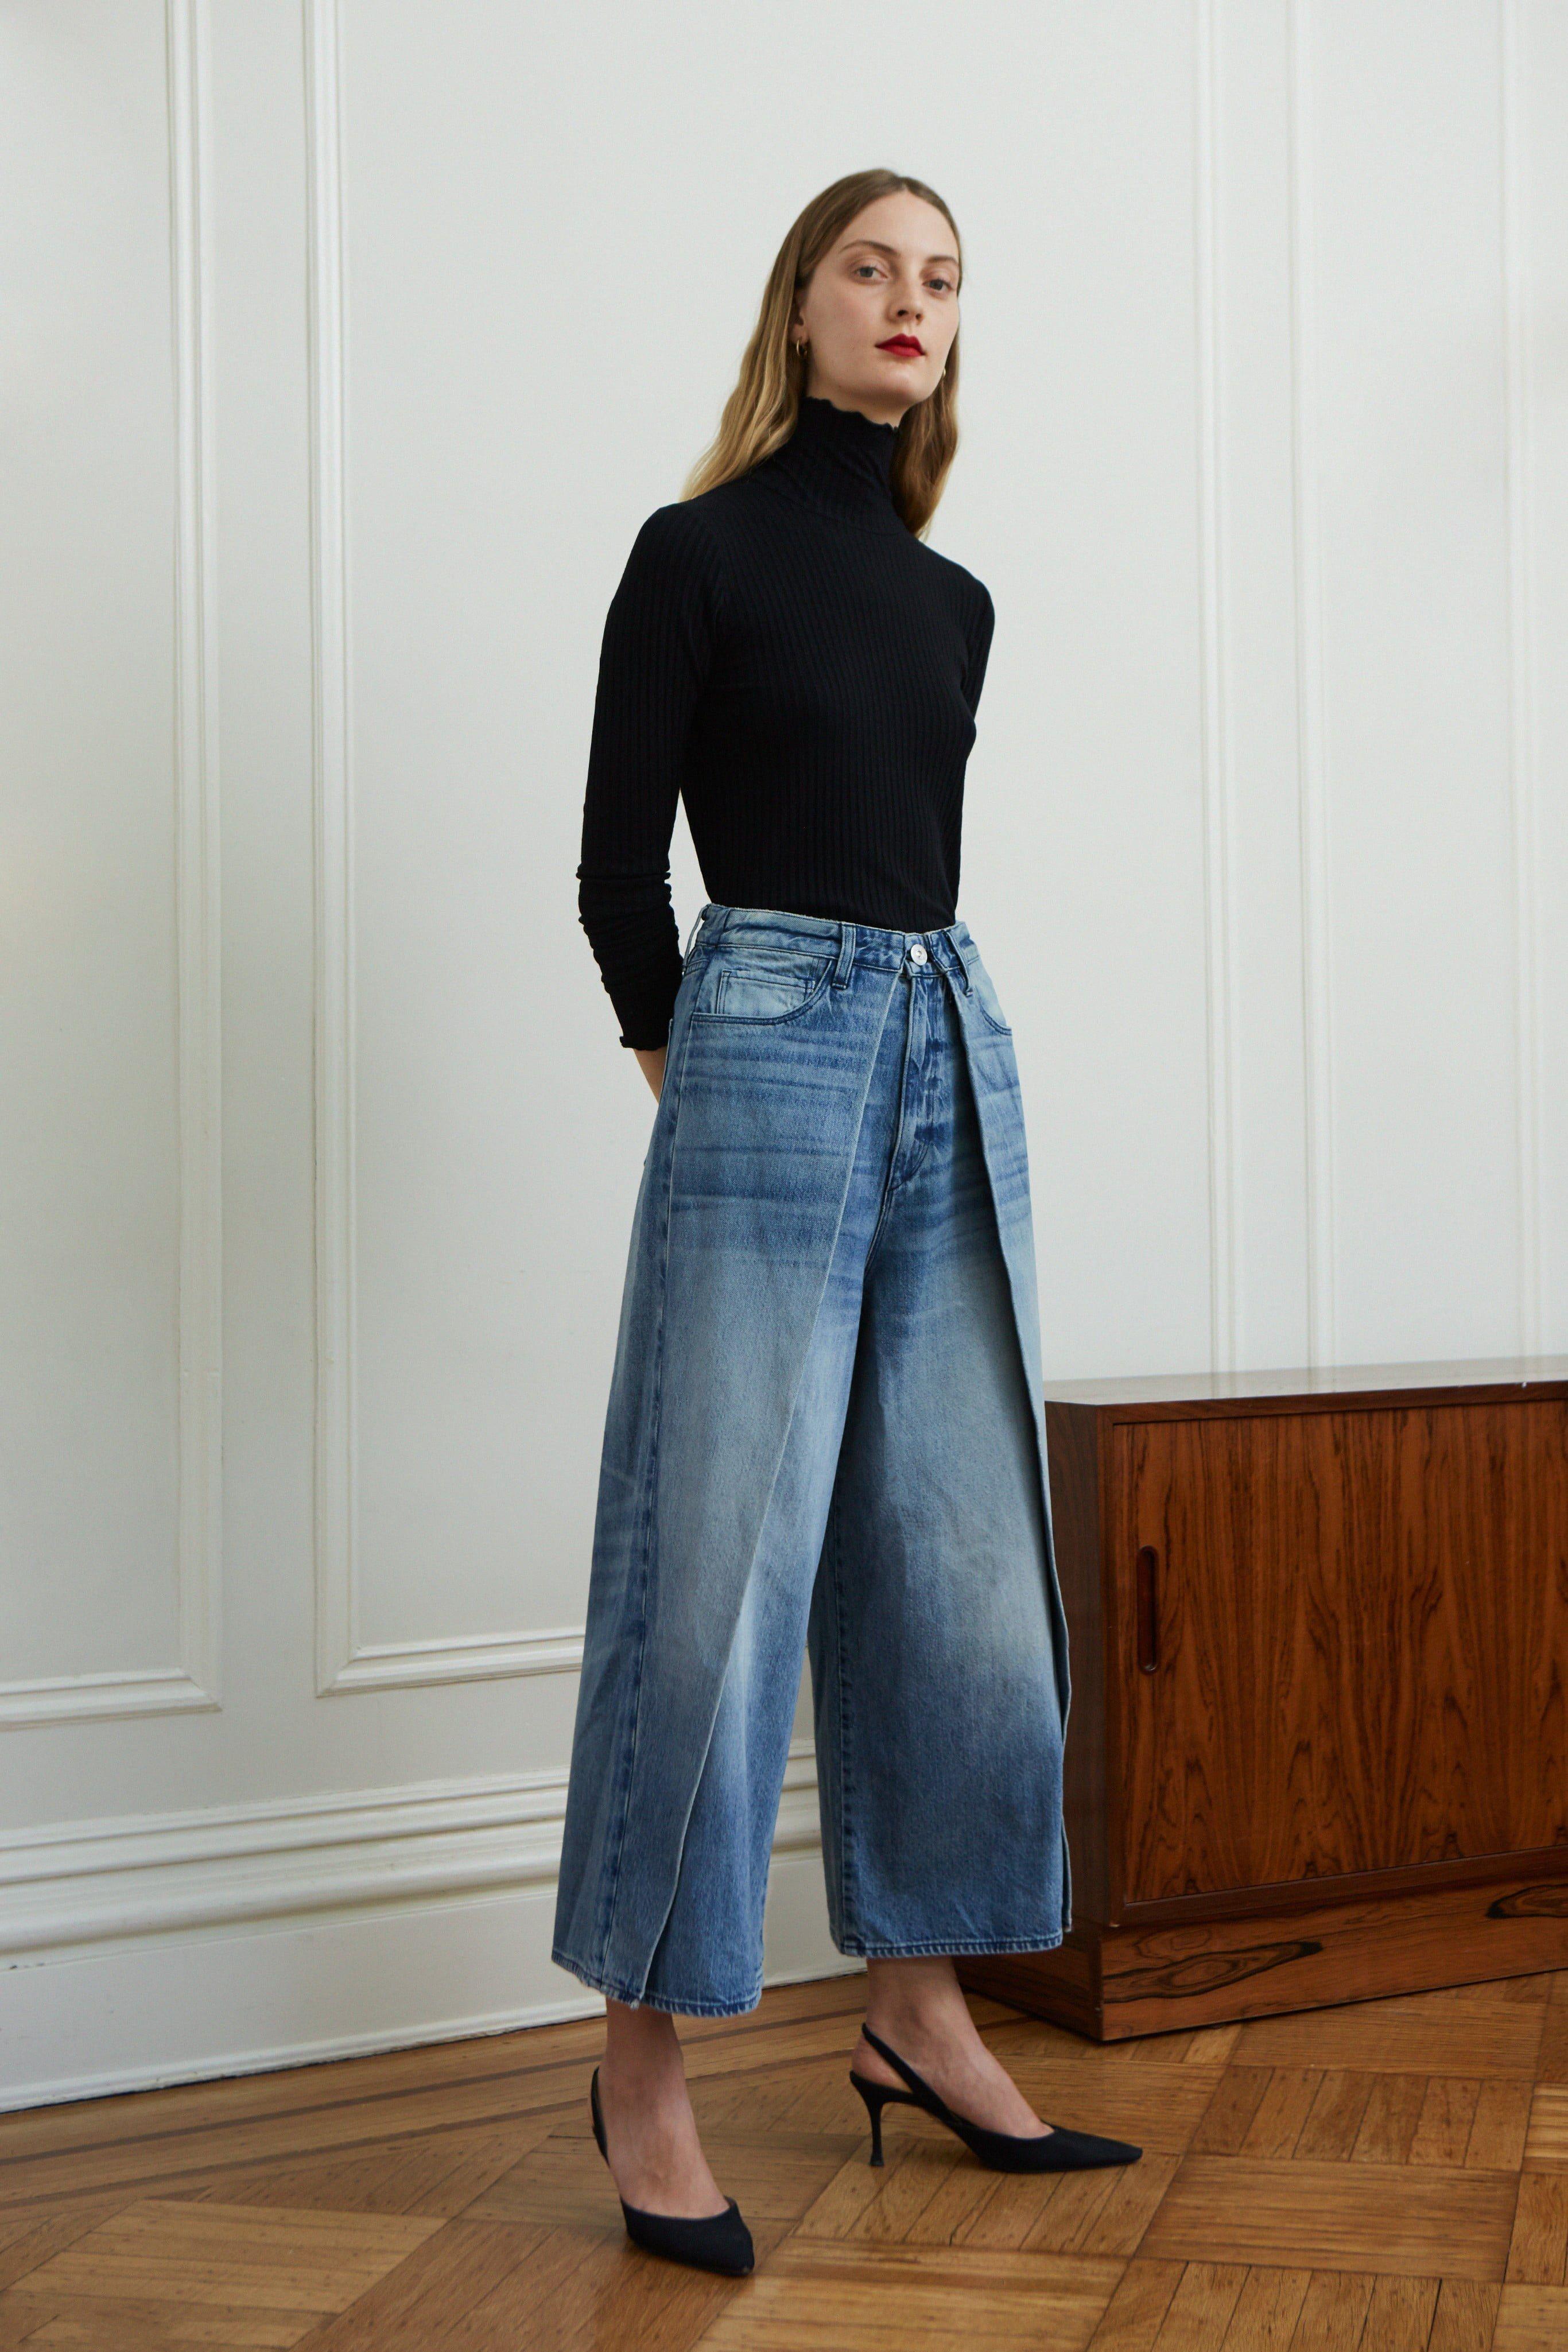 918c1c530d 3x1 Resort 2019 New York Collection - Vogue